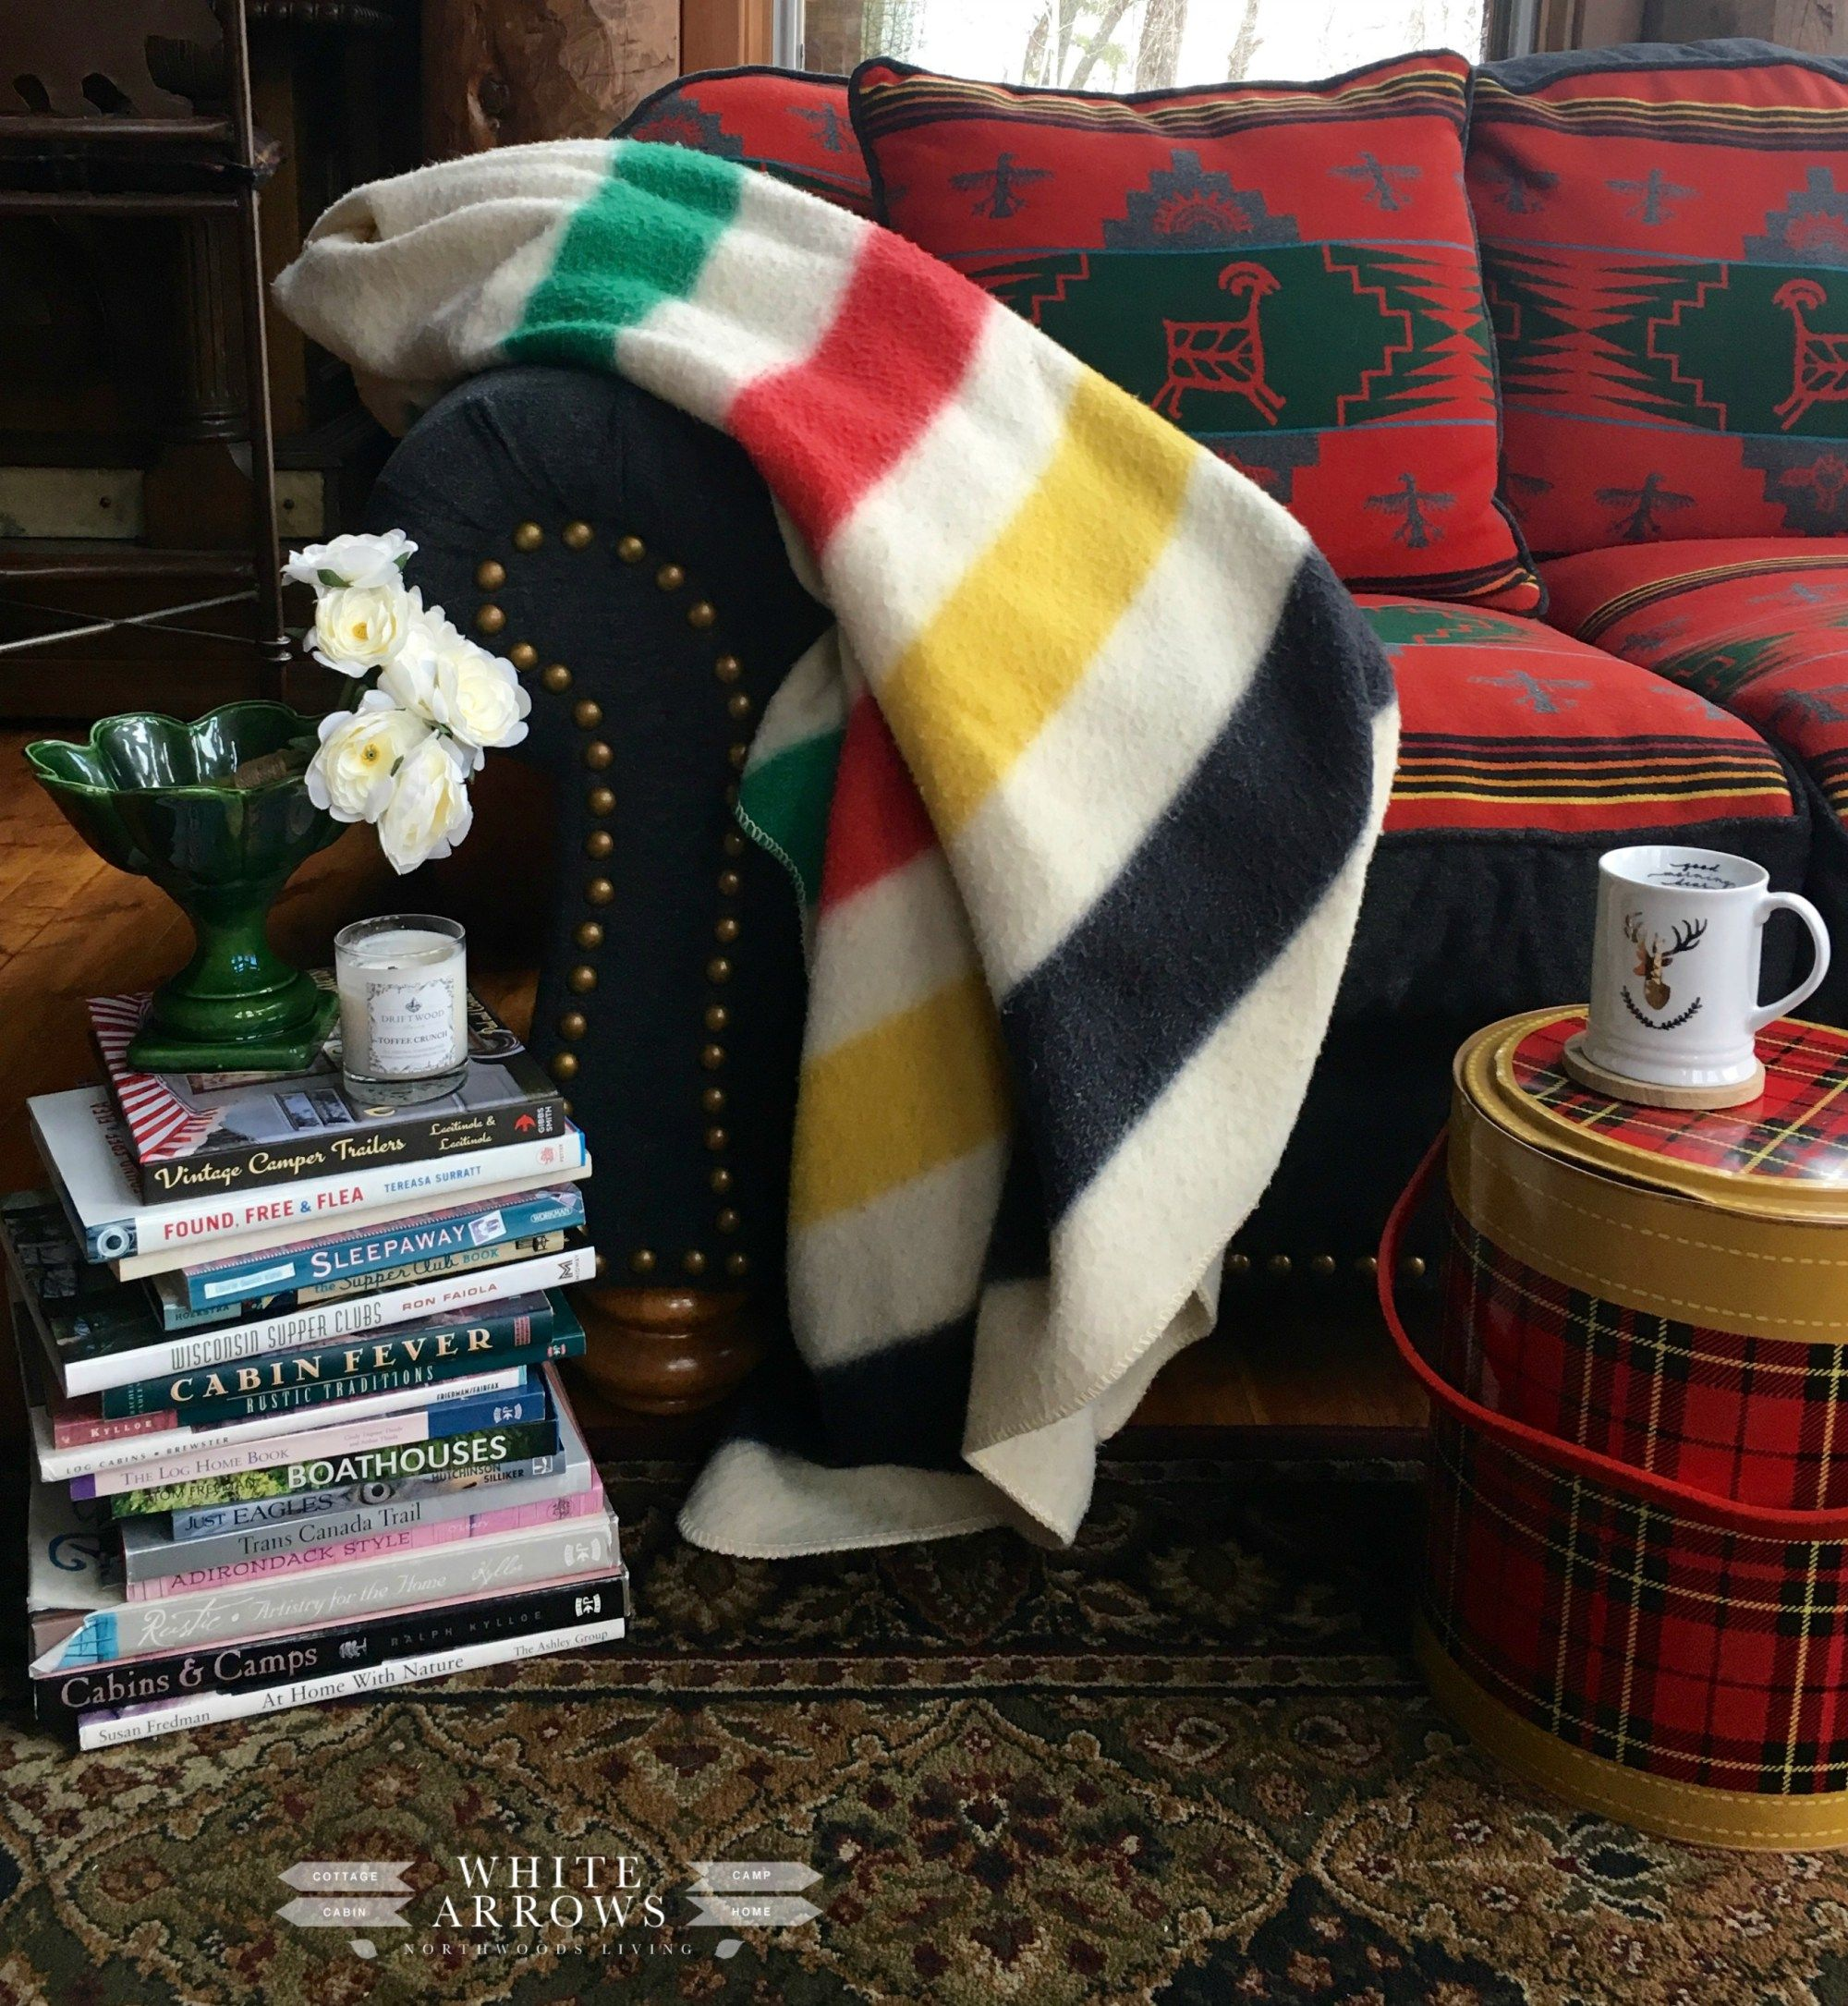 white pine coffee table books